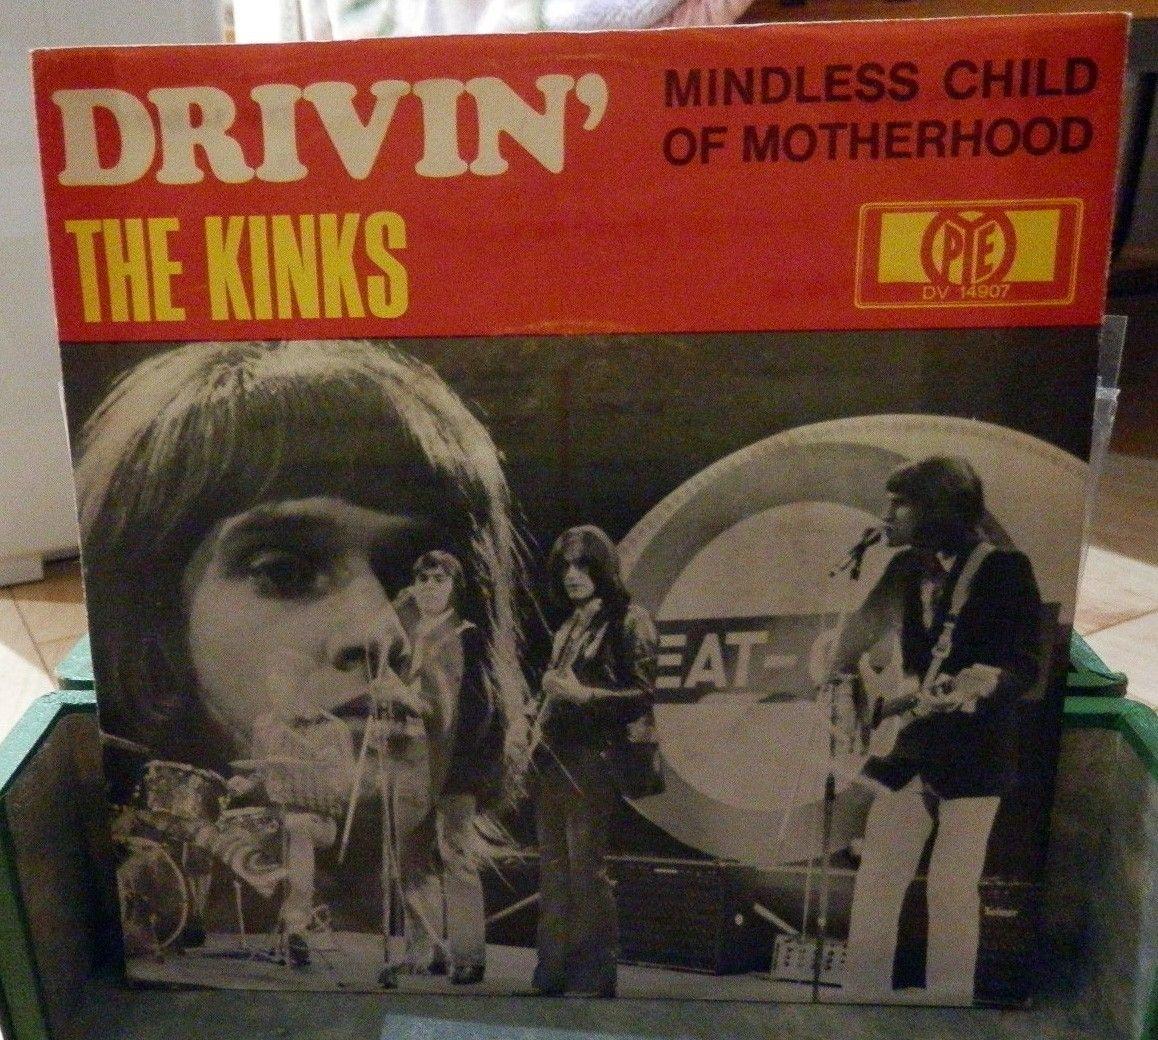 Drivin The Kinks